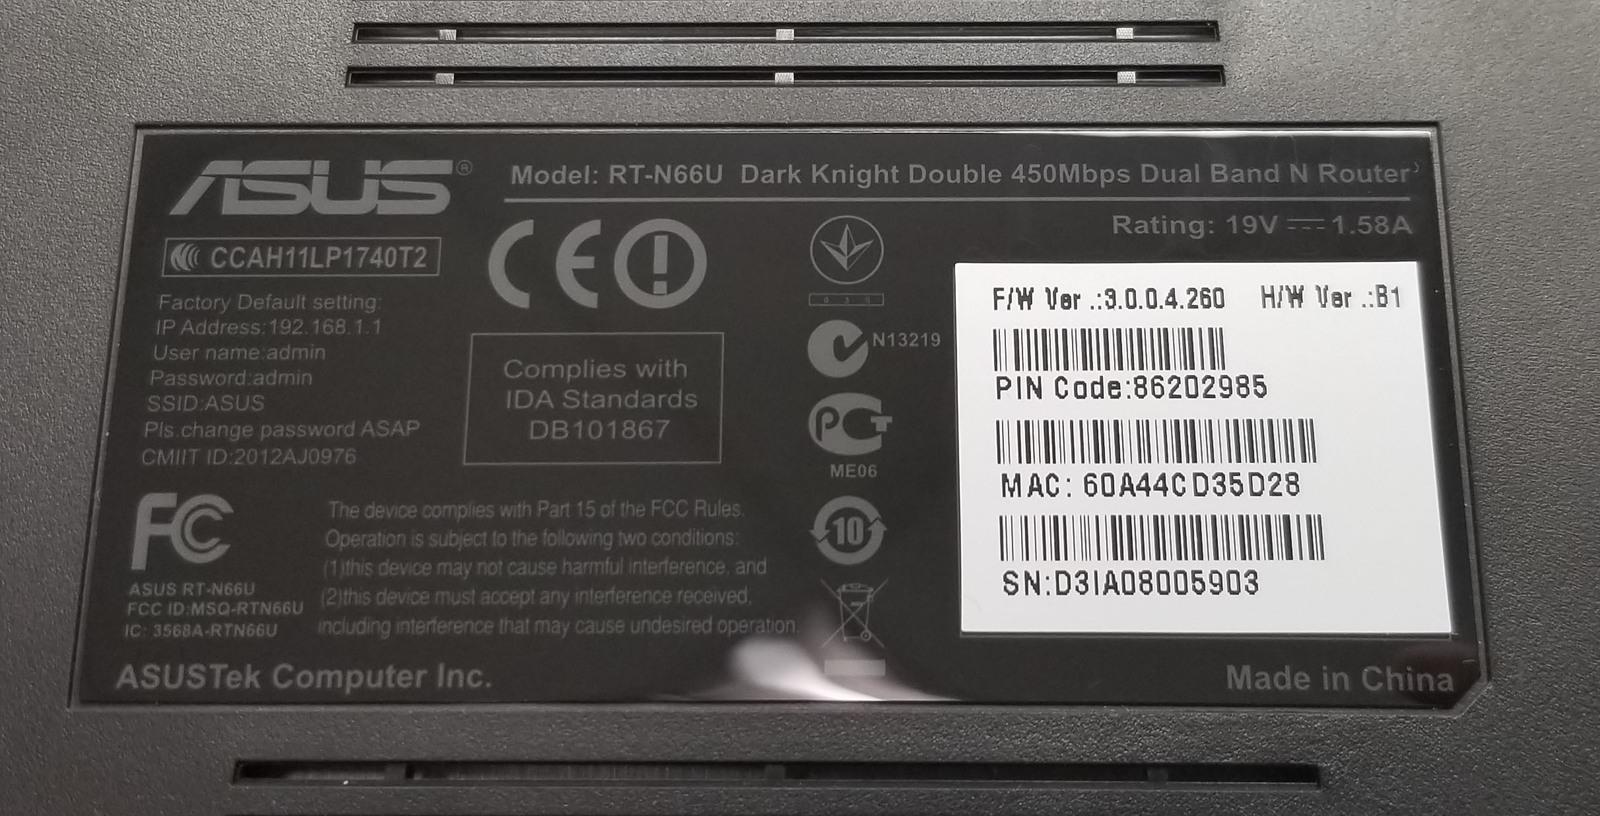 Asus Double 450Mbps N Router RT-N66U Dark Knight Bin:4